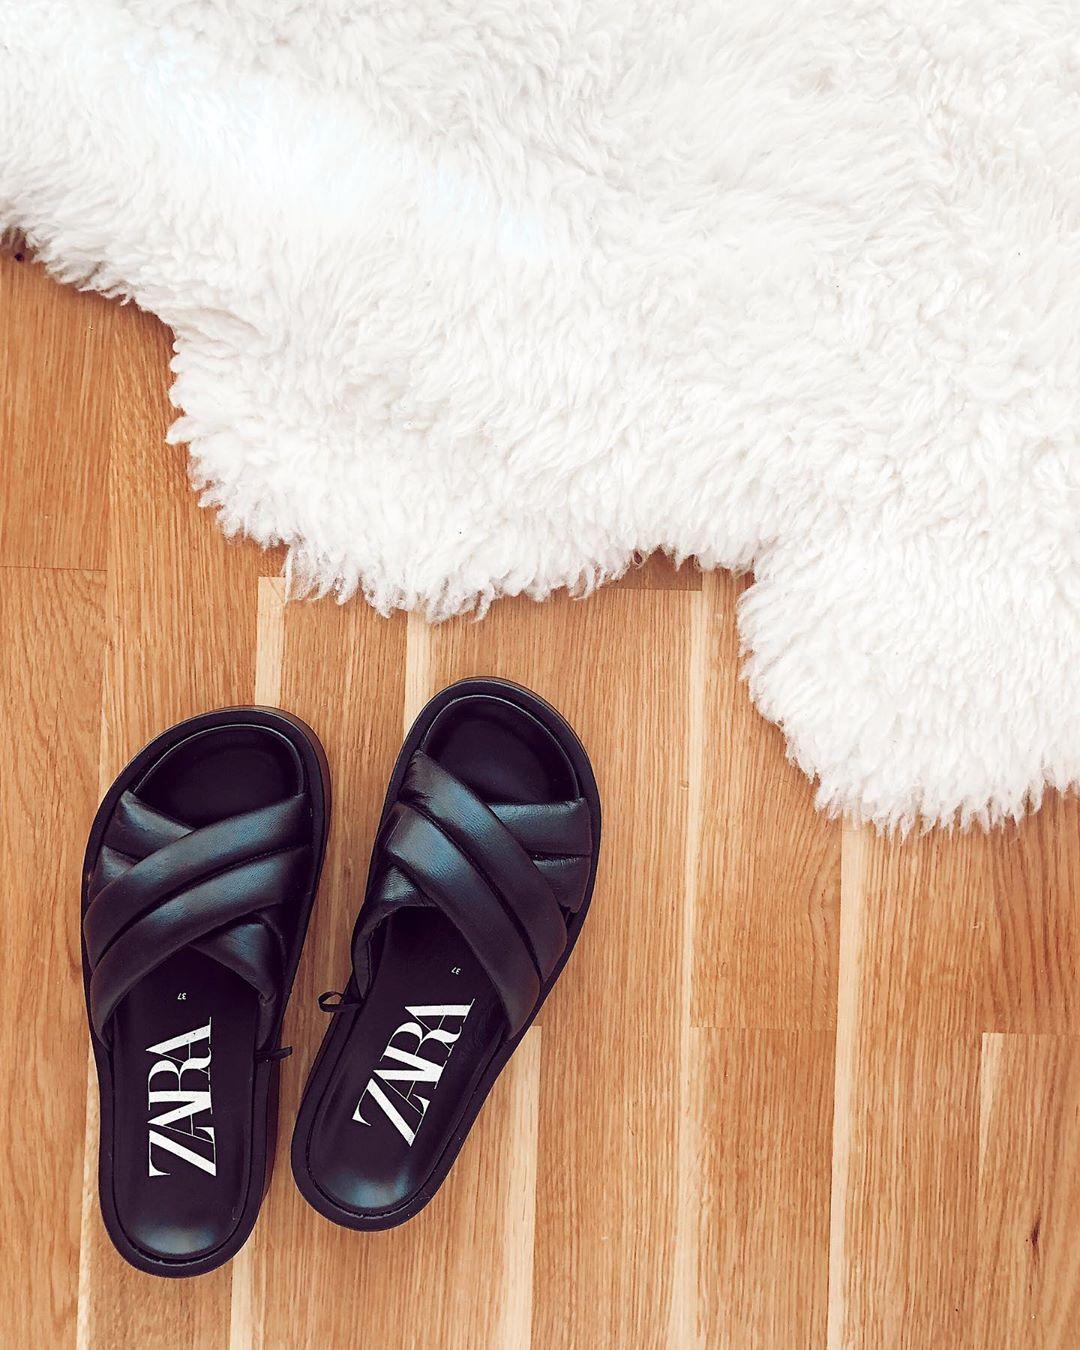 padded flatform leather sandals de Zara sur mariatilve